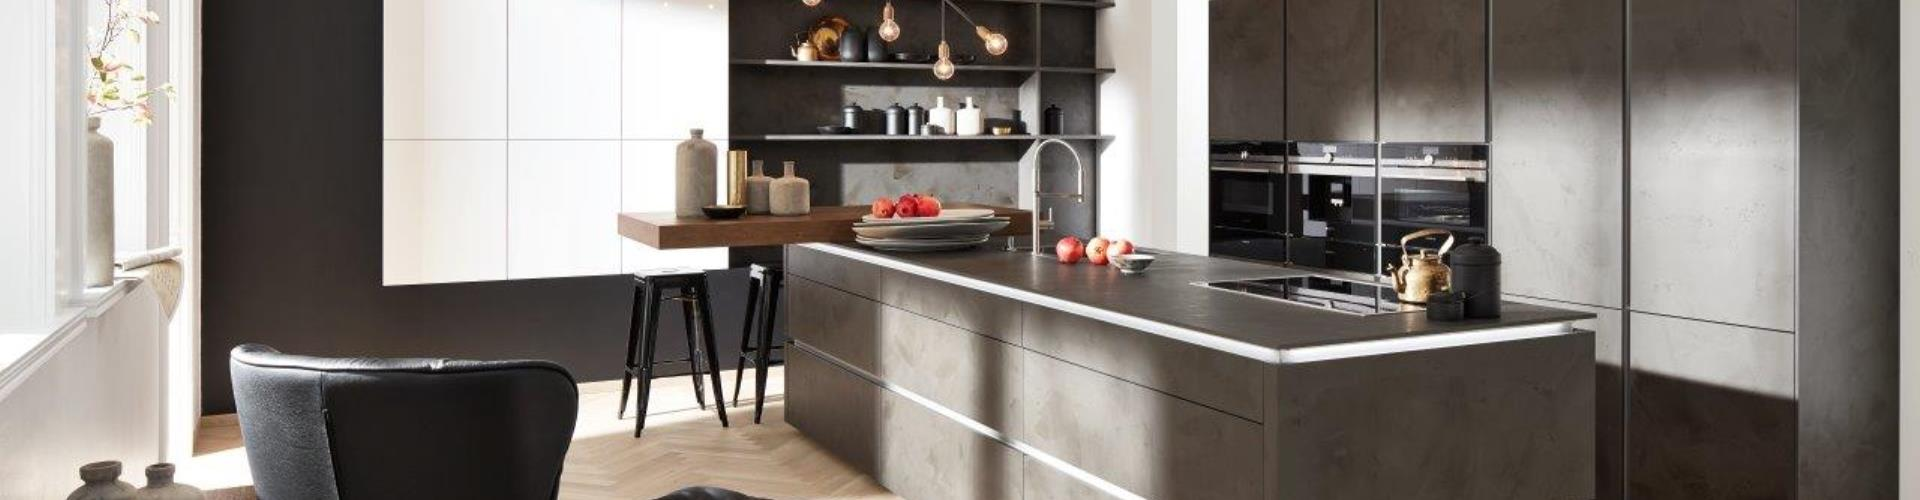 accueil cuisine nolte. Black Bedroom Furniture Sets. Home Design Ideas